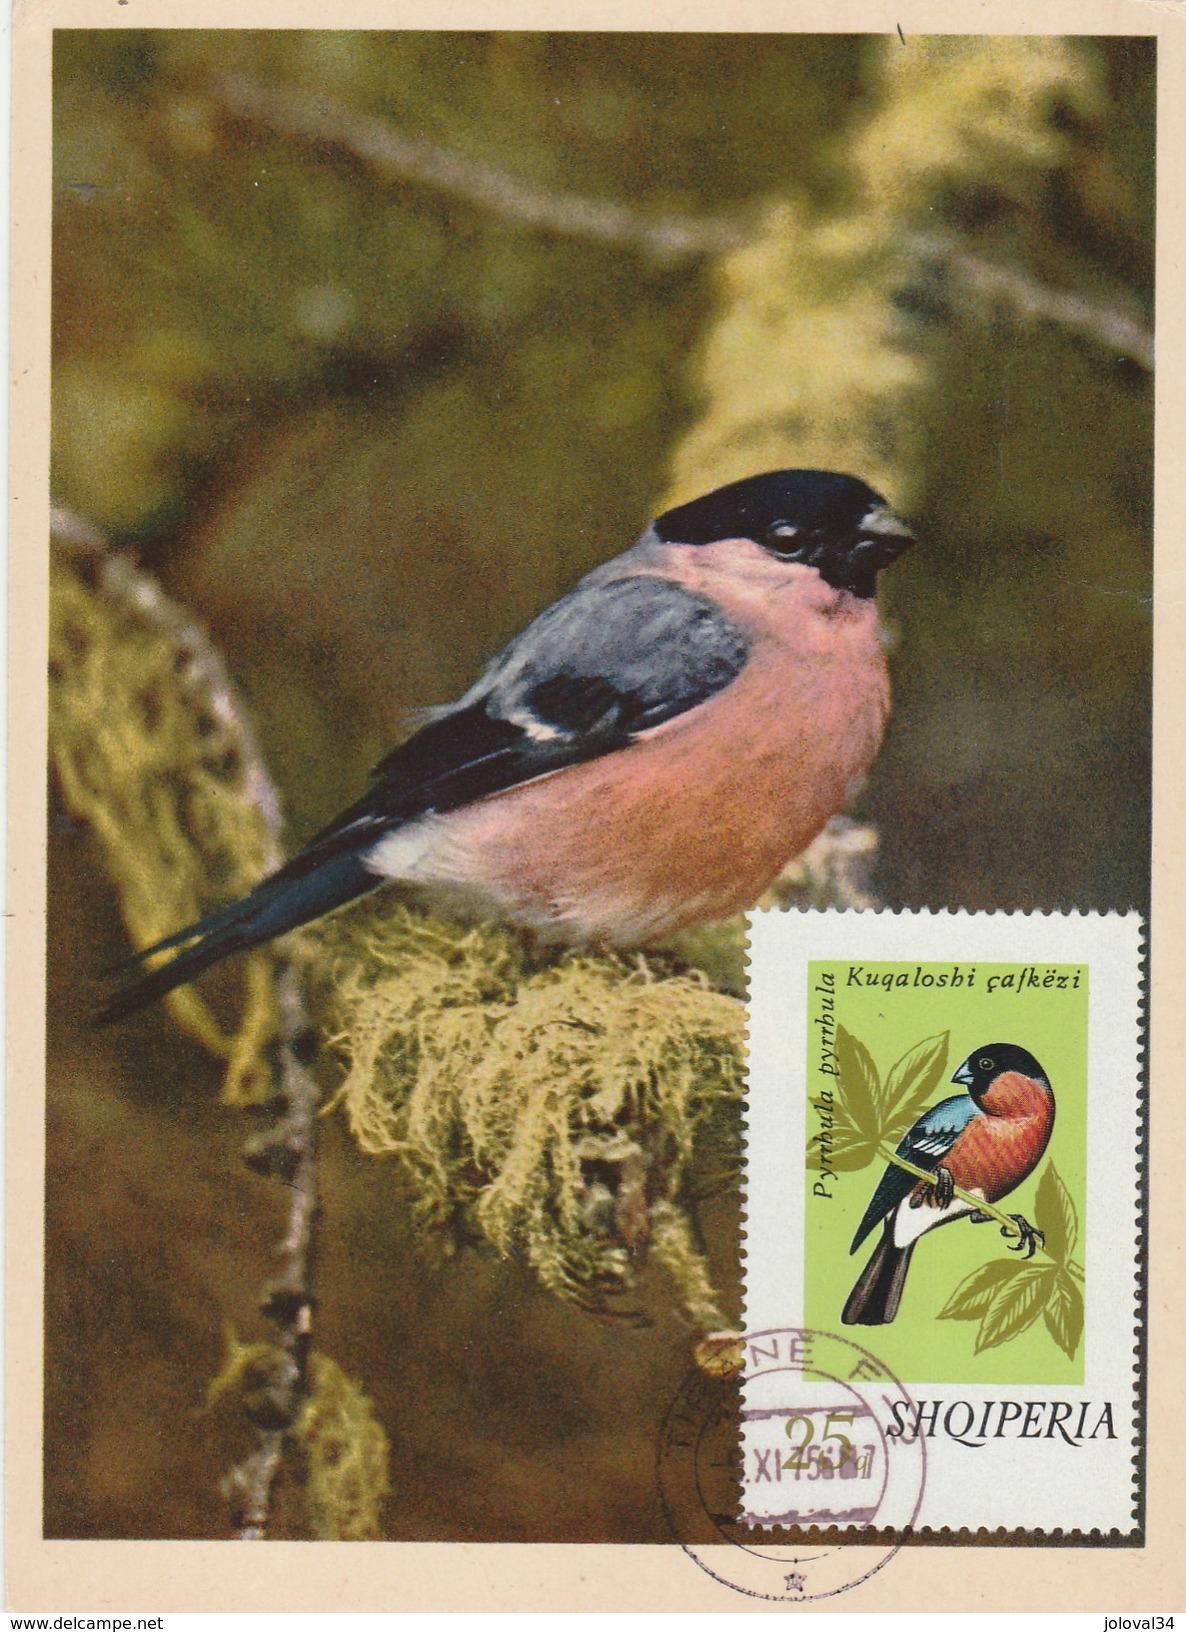 Albanie Carte Maximum 1975  Yvert  1525 - Rouge Gorge  - Thème Animaux Oiseaux Chanteurs - Albanie